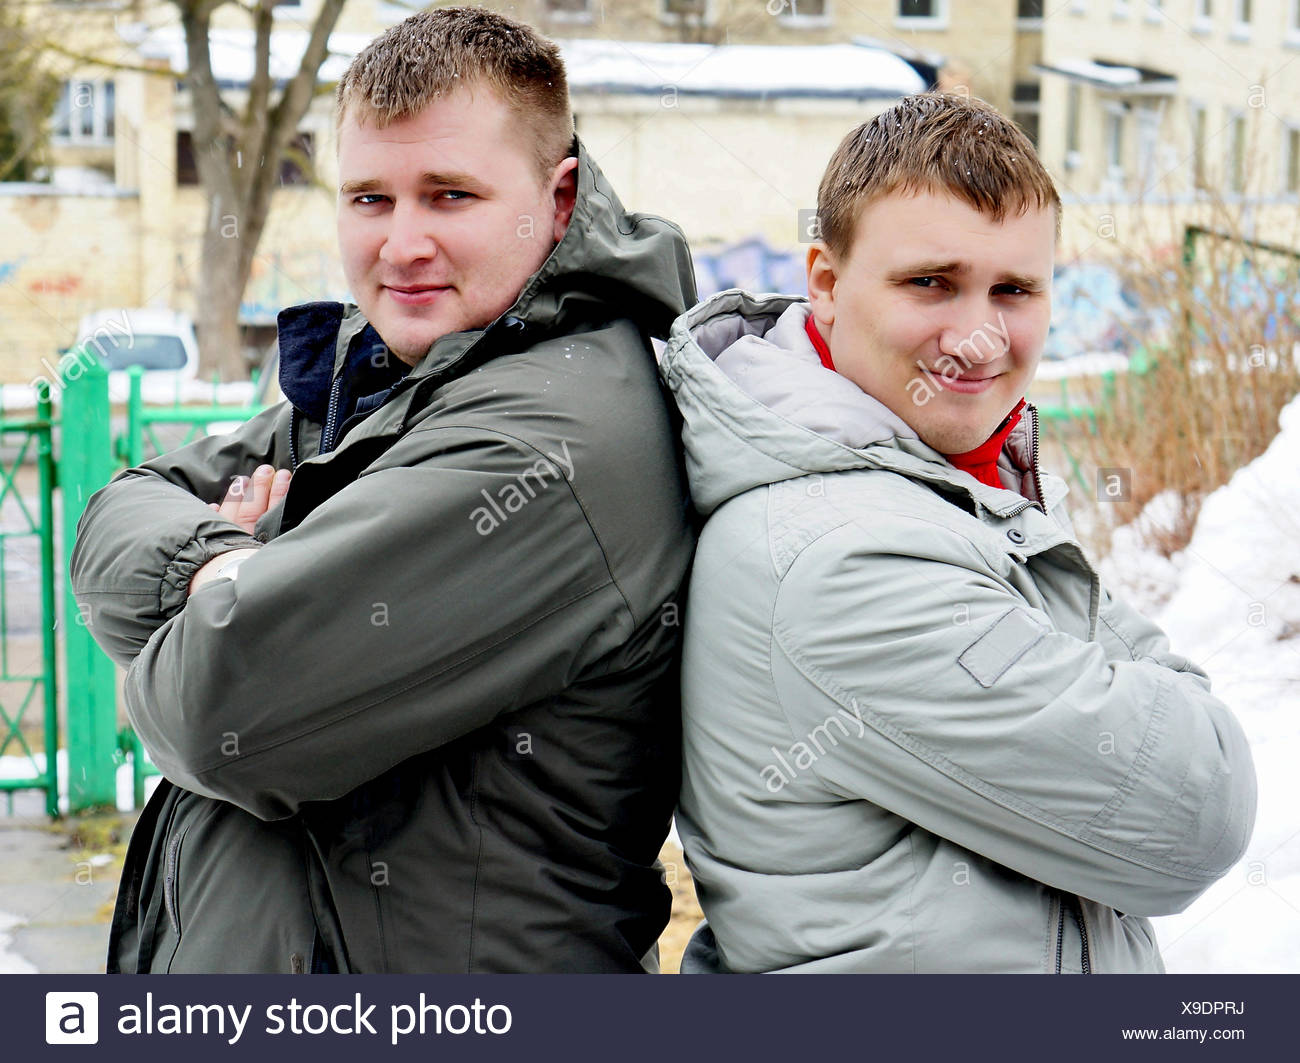 Zwei Jungs in Jacken Stockbild